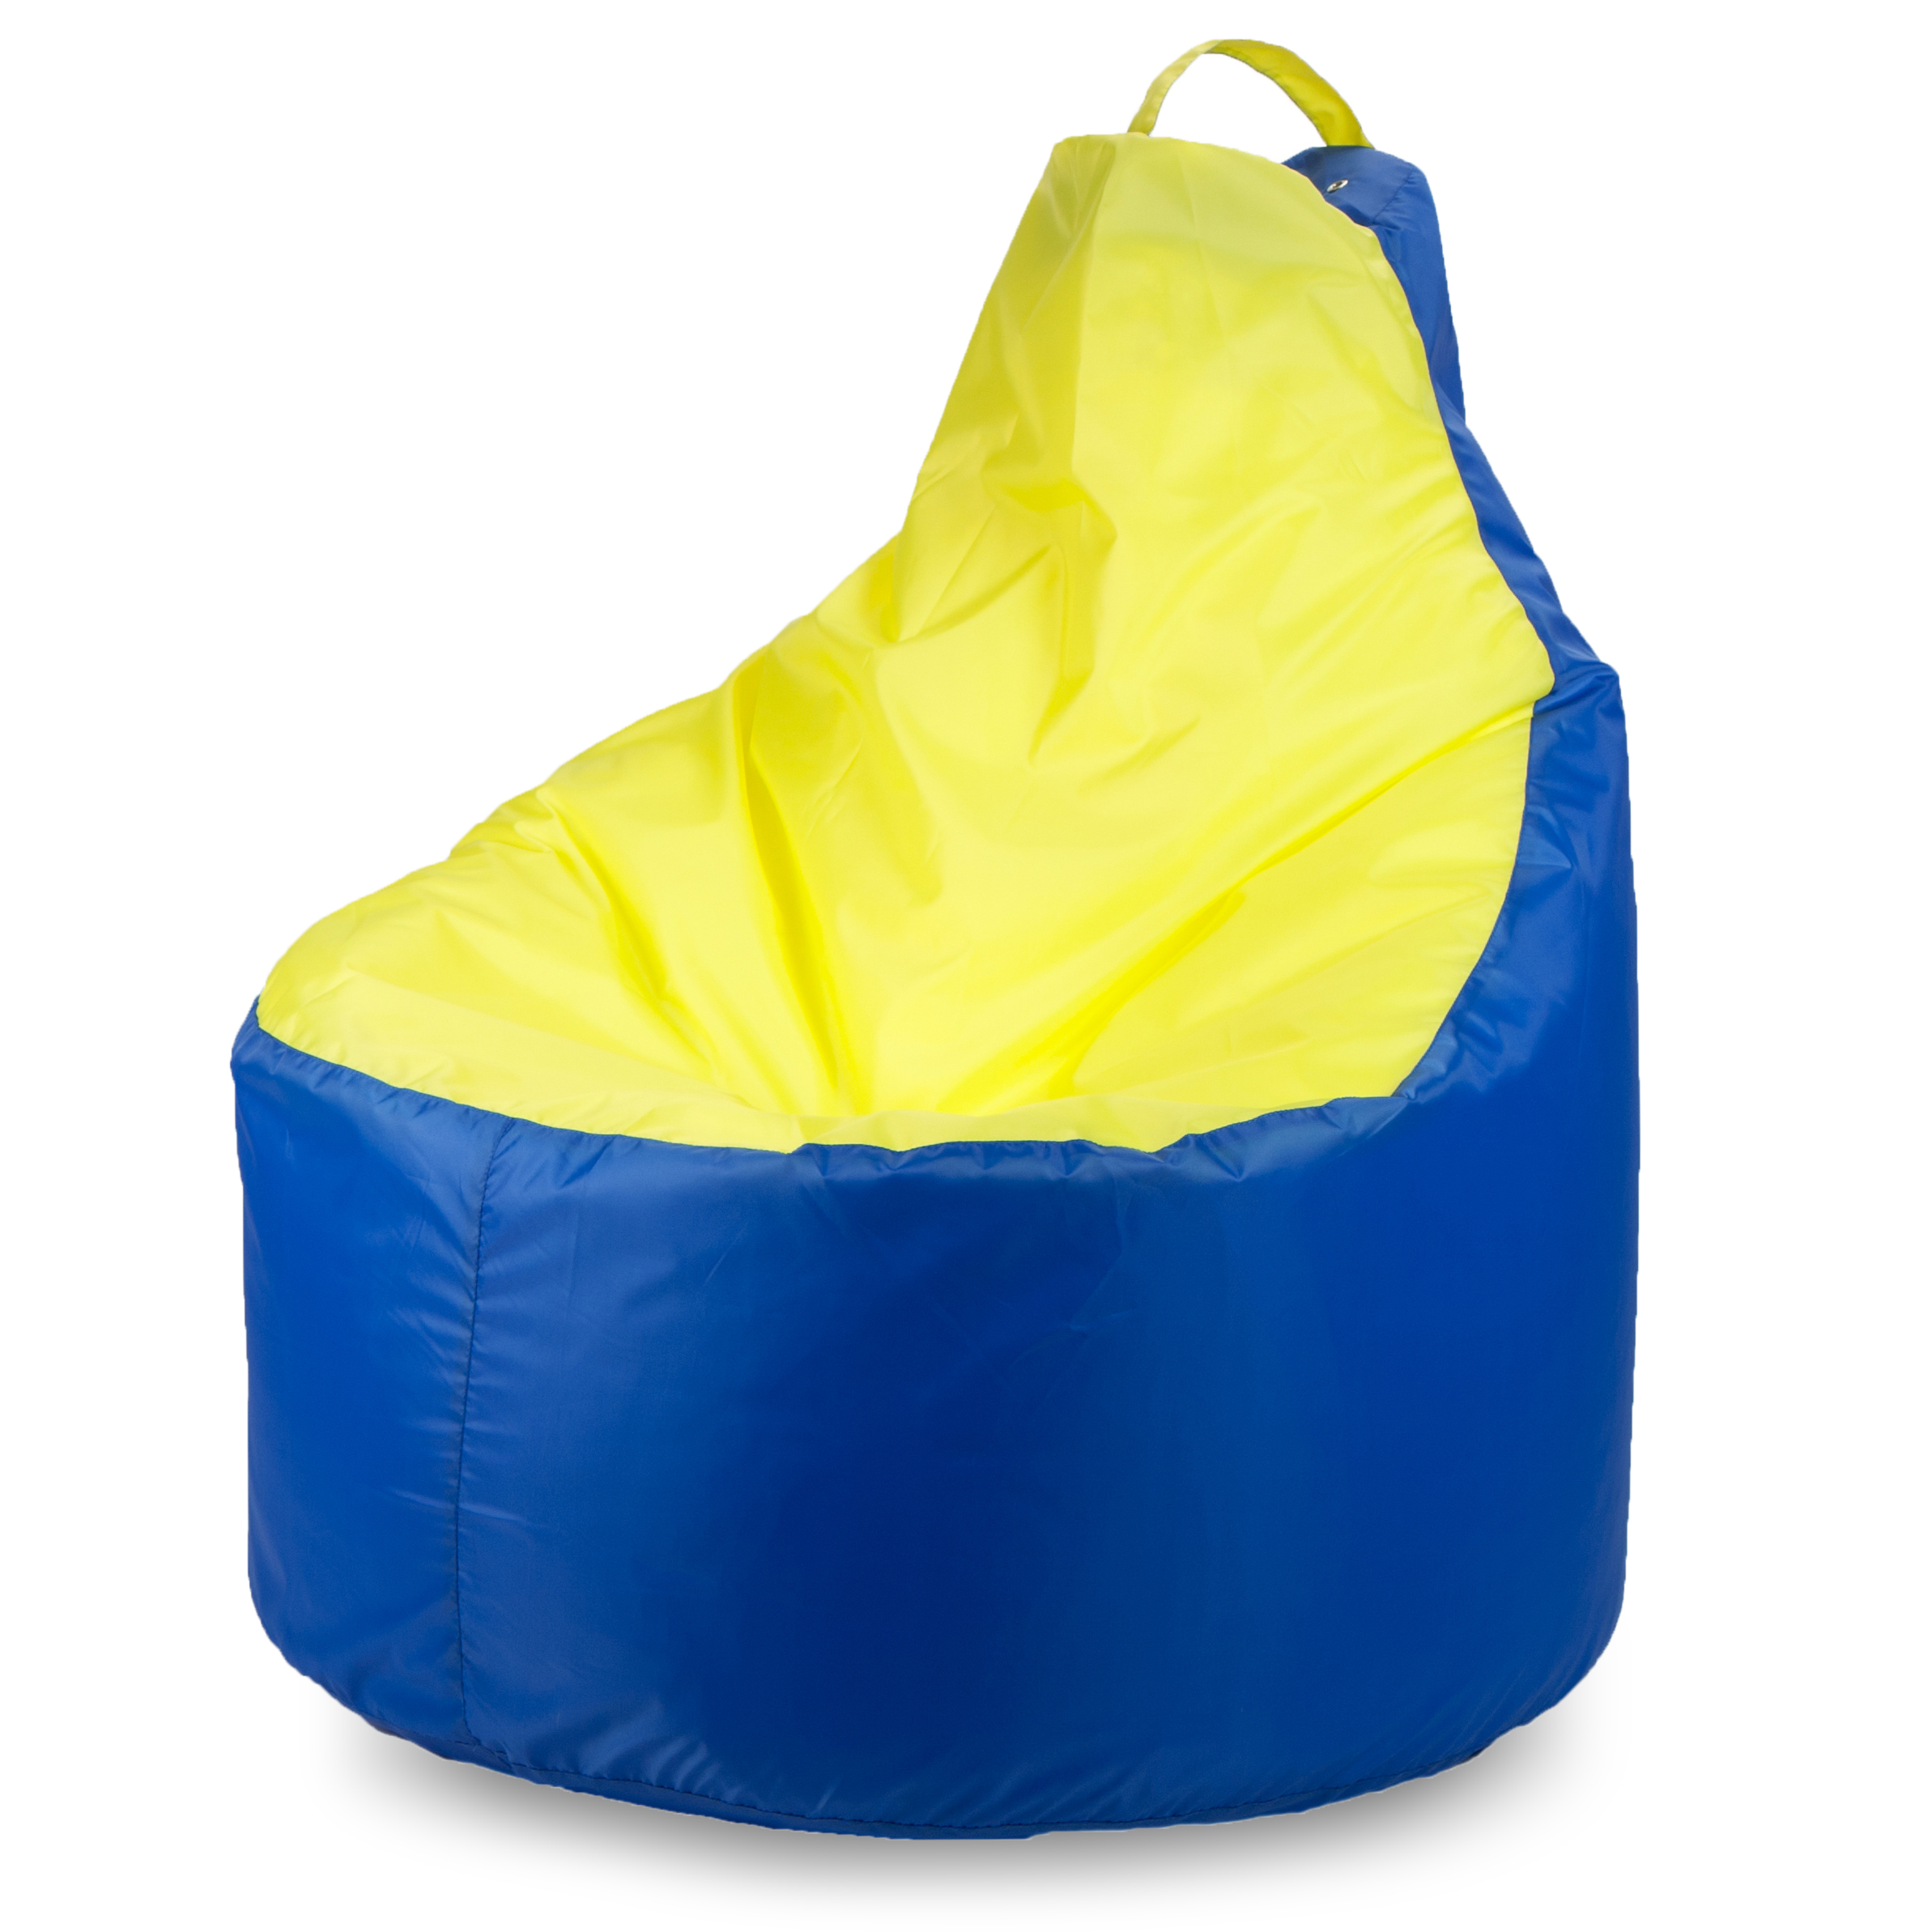 Комплект чехлов Кресло мешок комфорт  145x90x90,